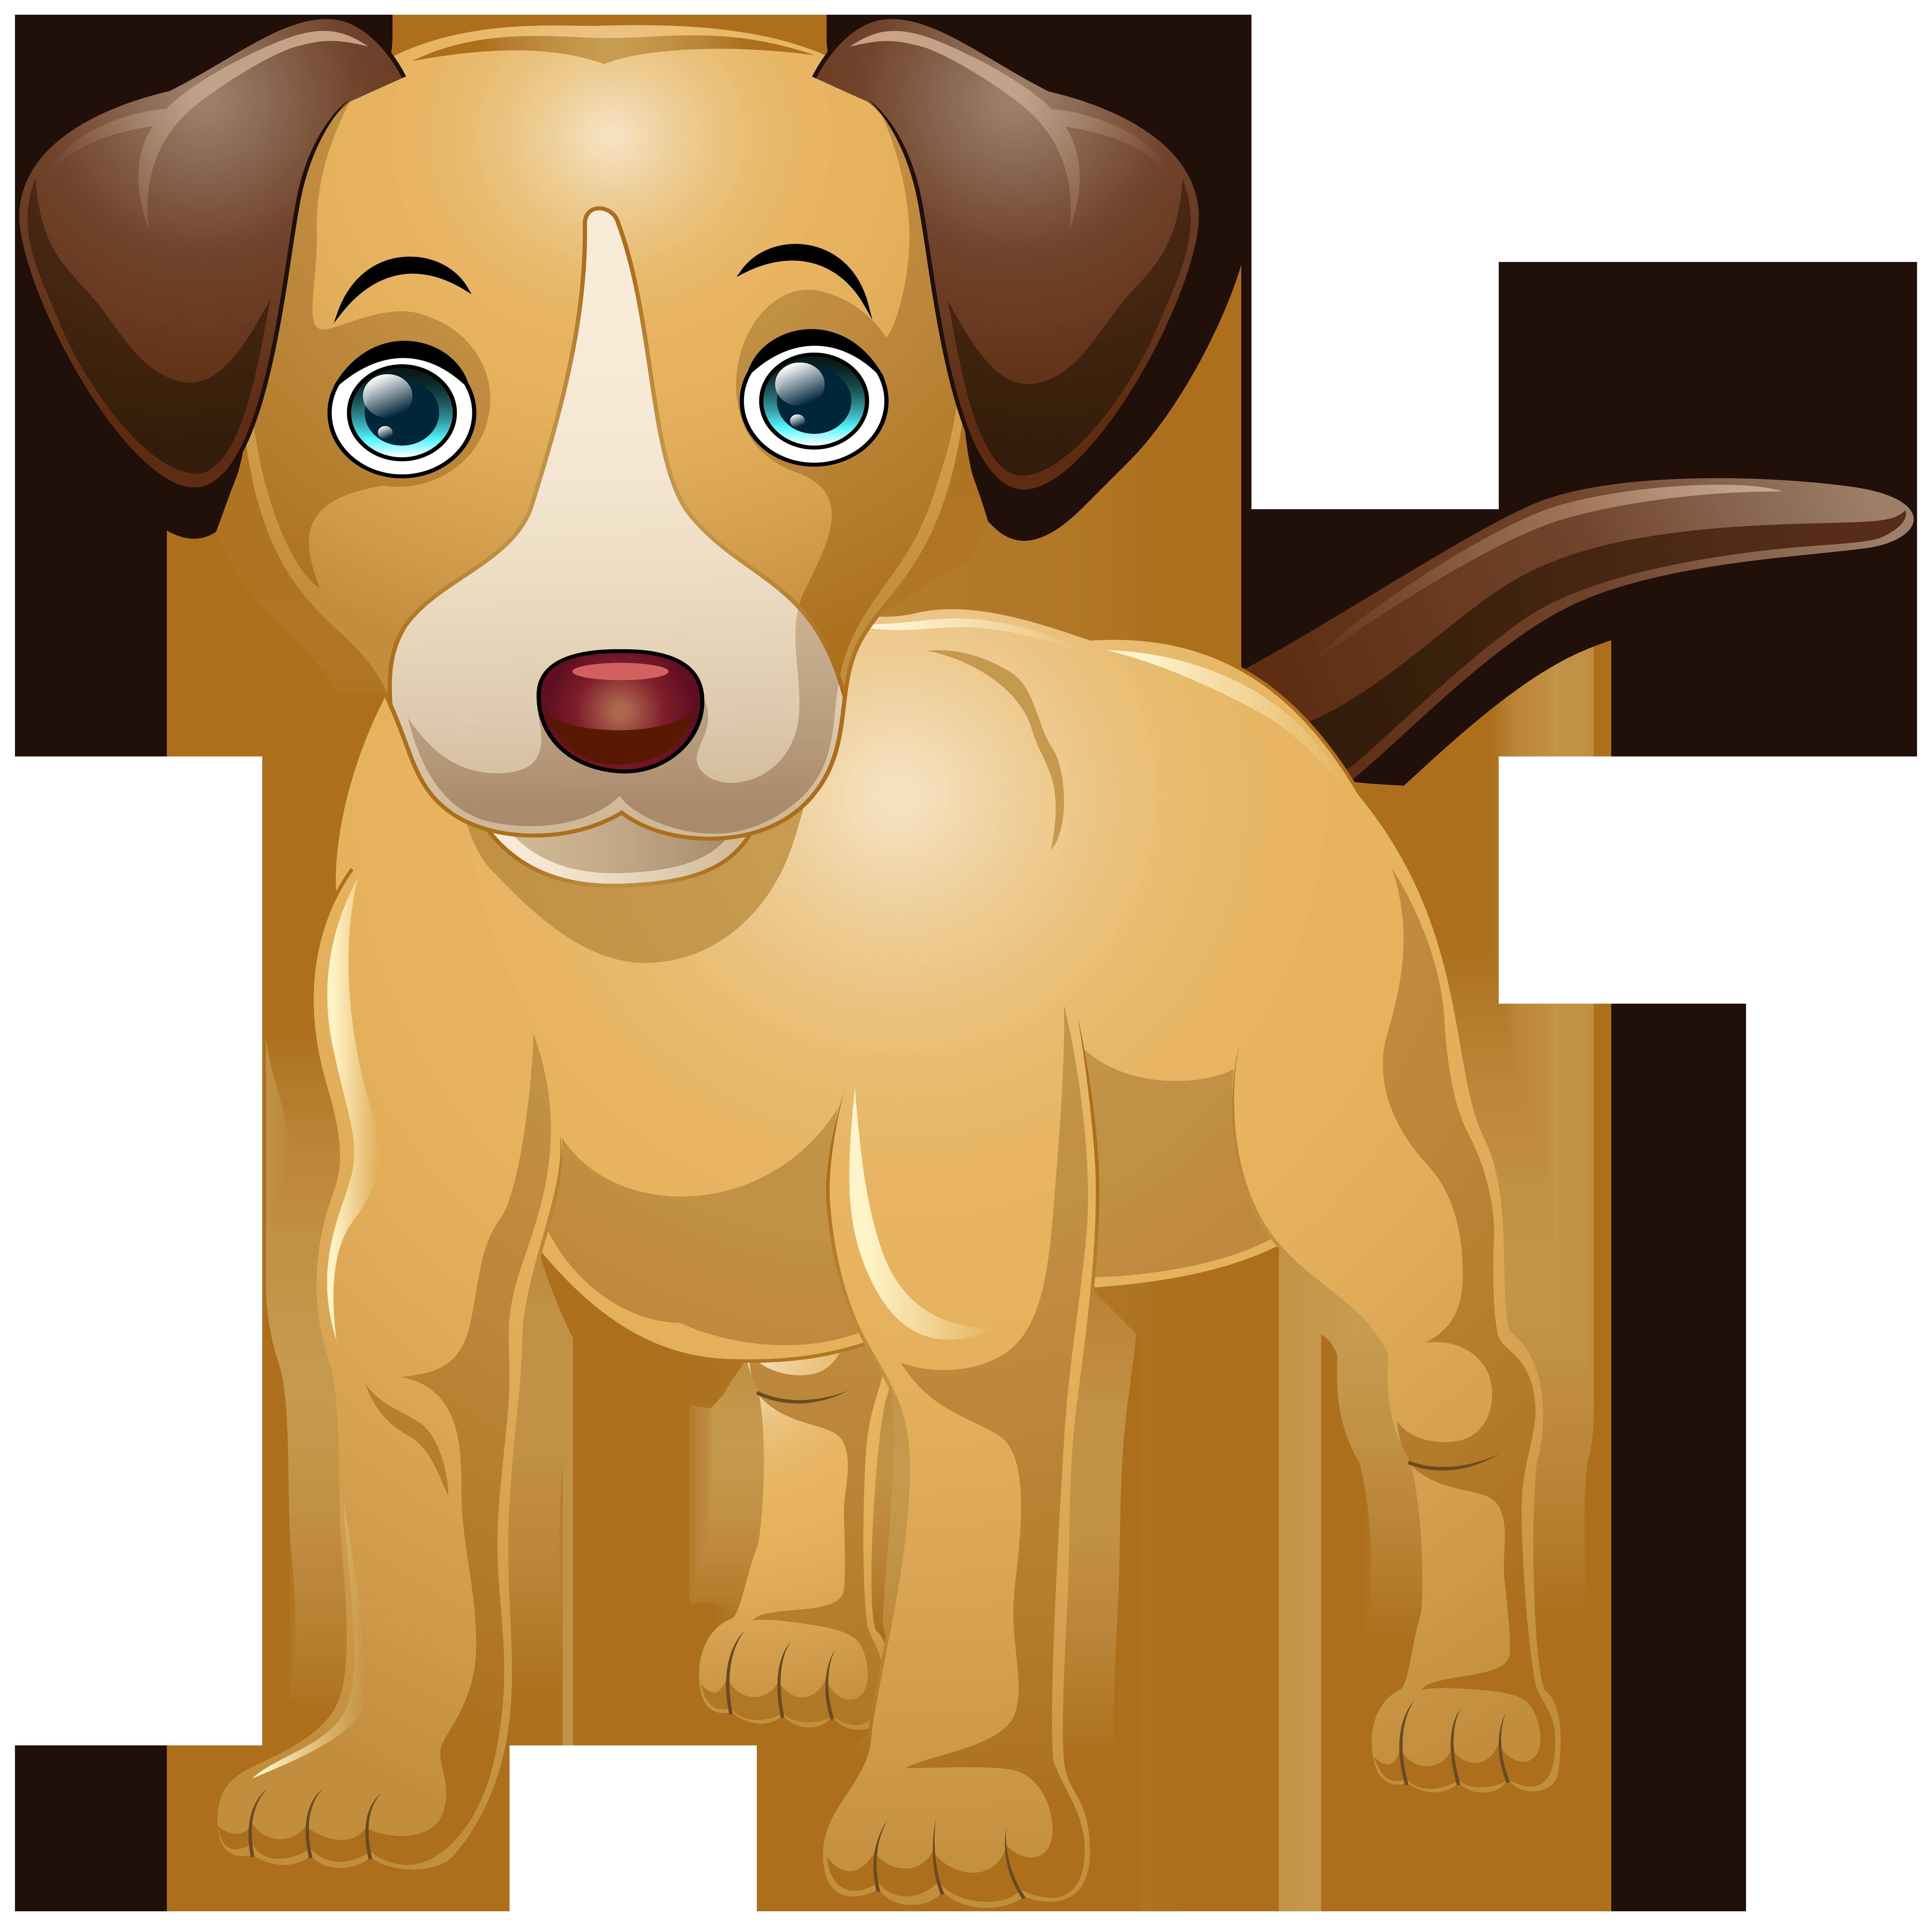 Puppy dog breed.